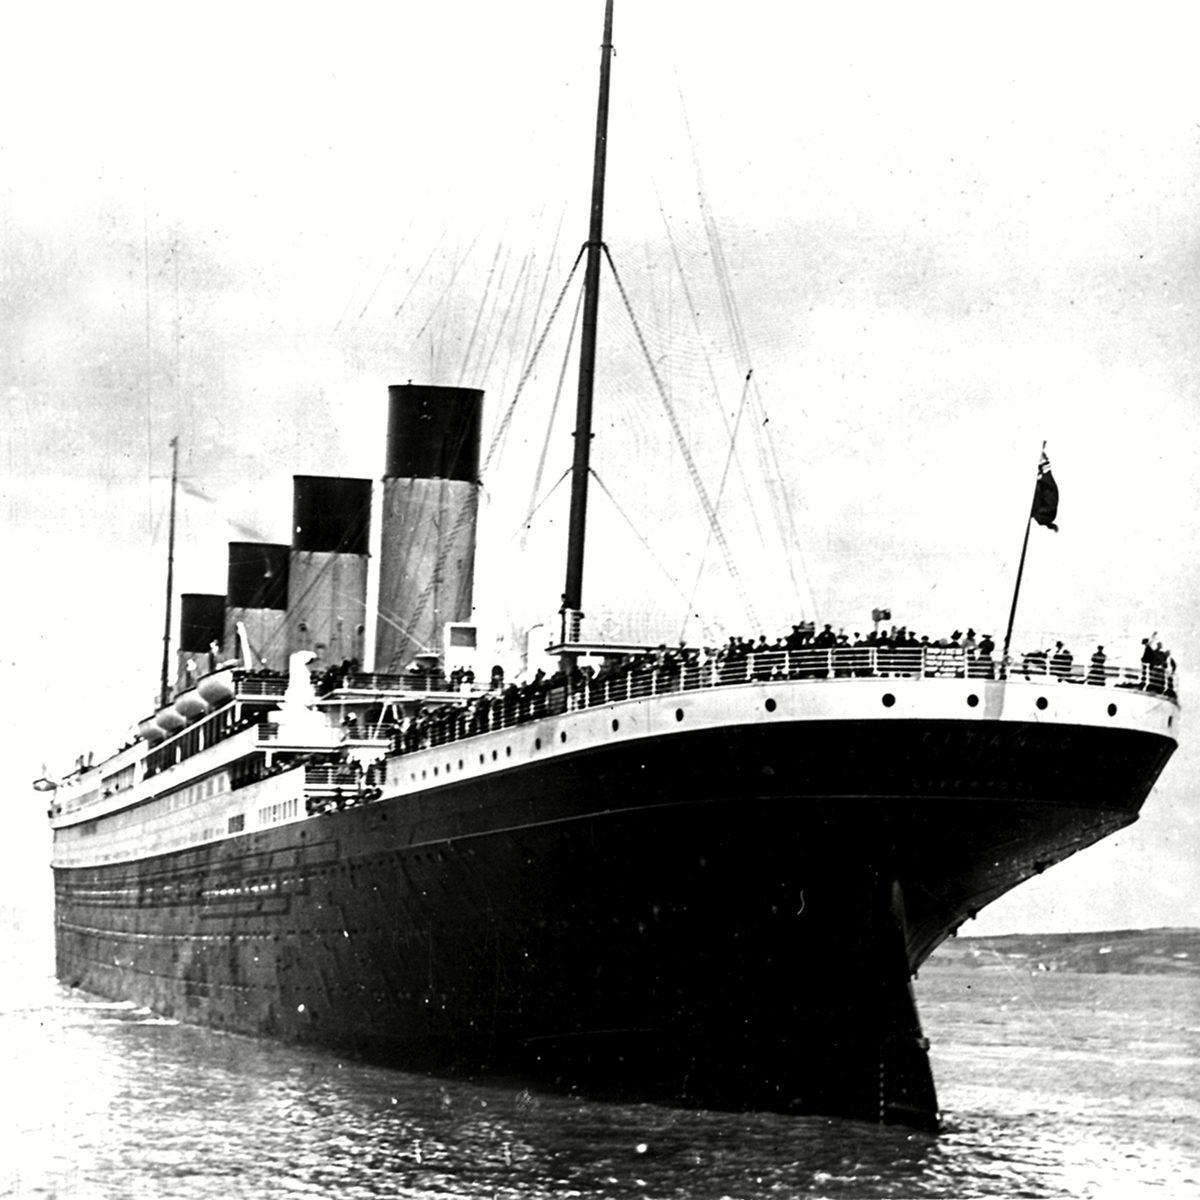 12 Amazing Foods People Ate Aboard the Titanic